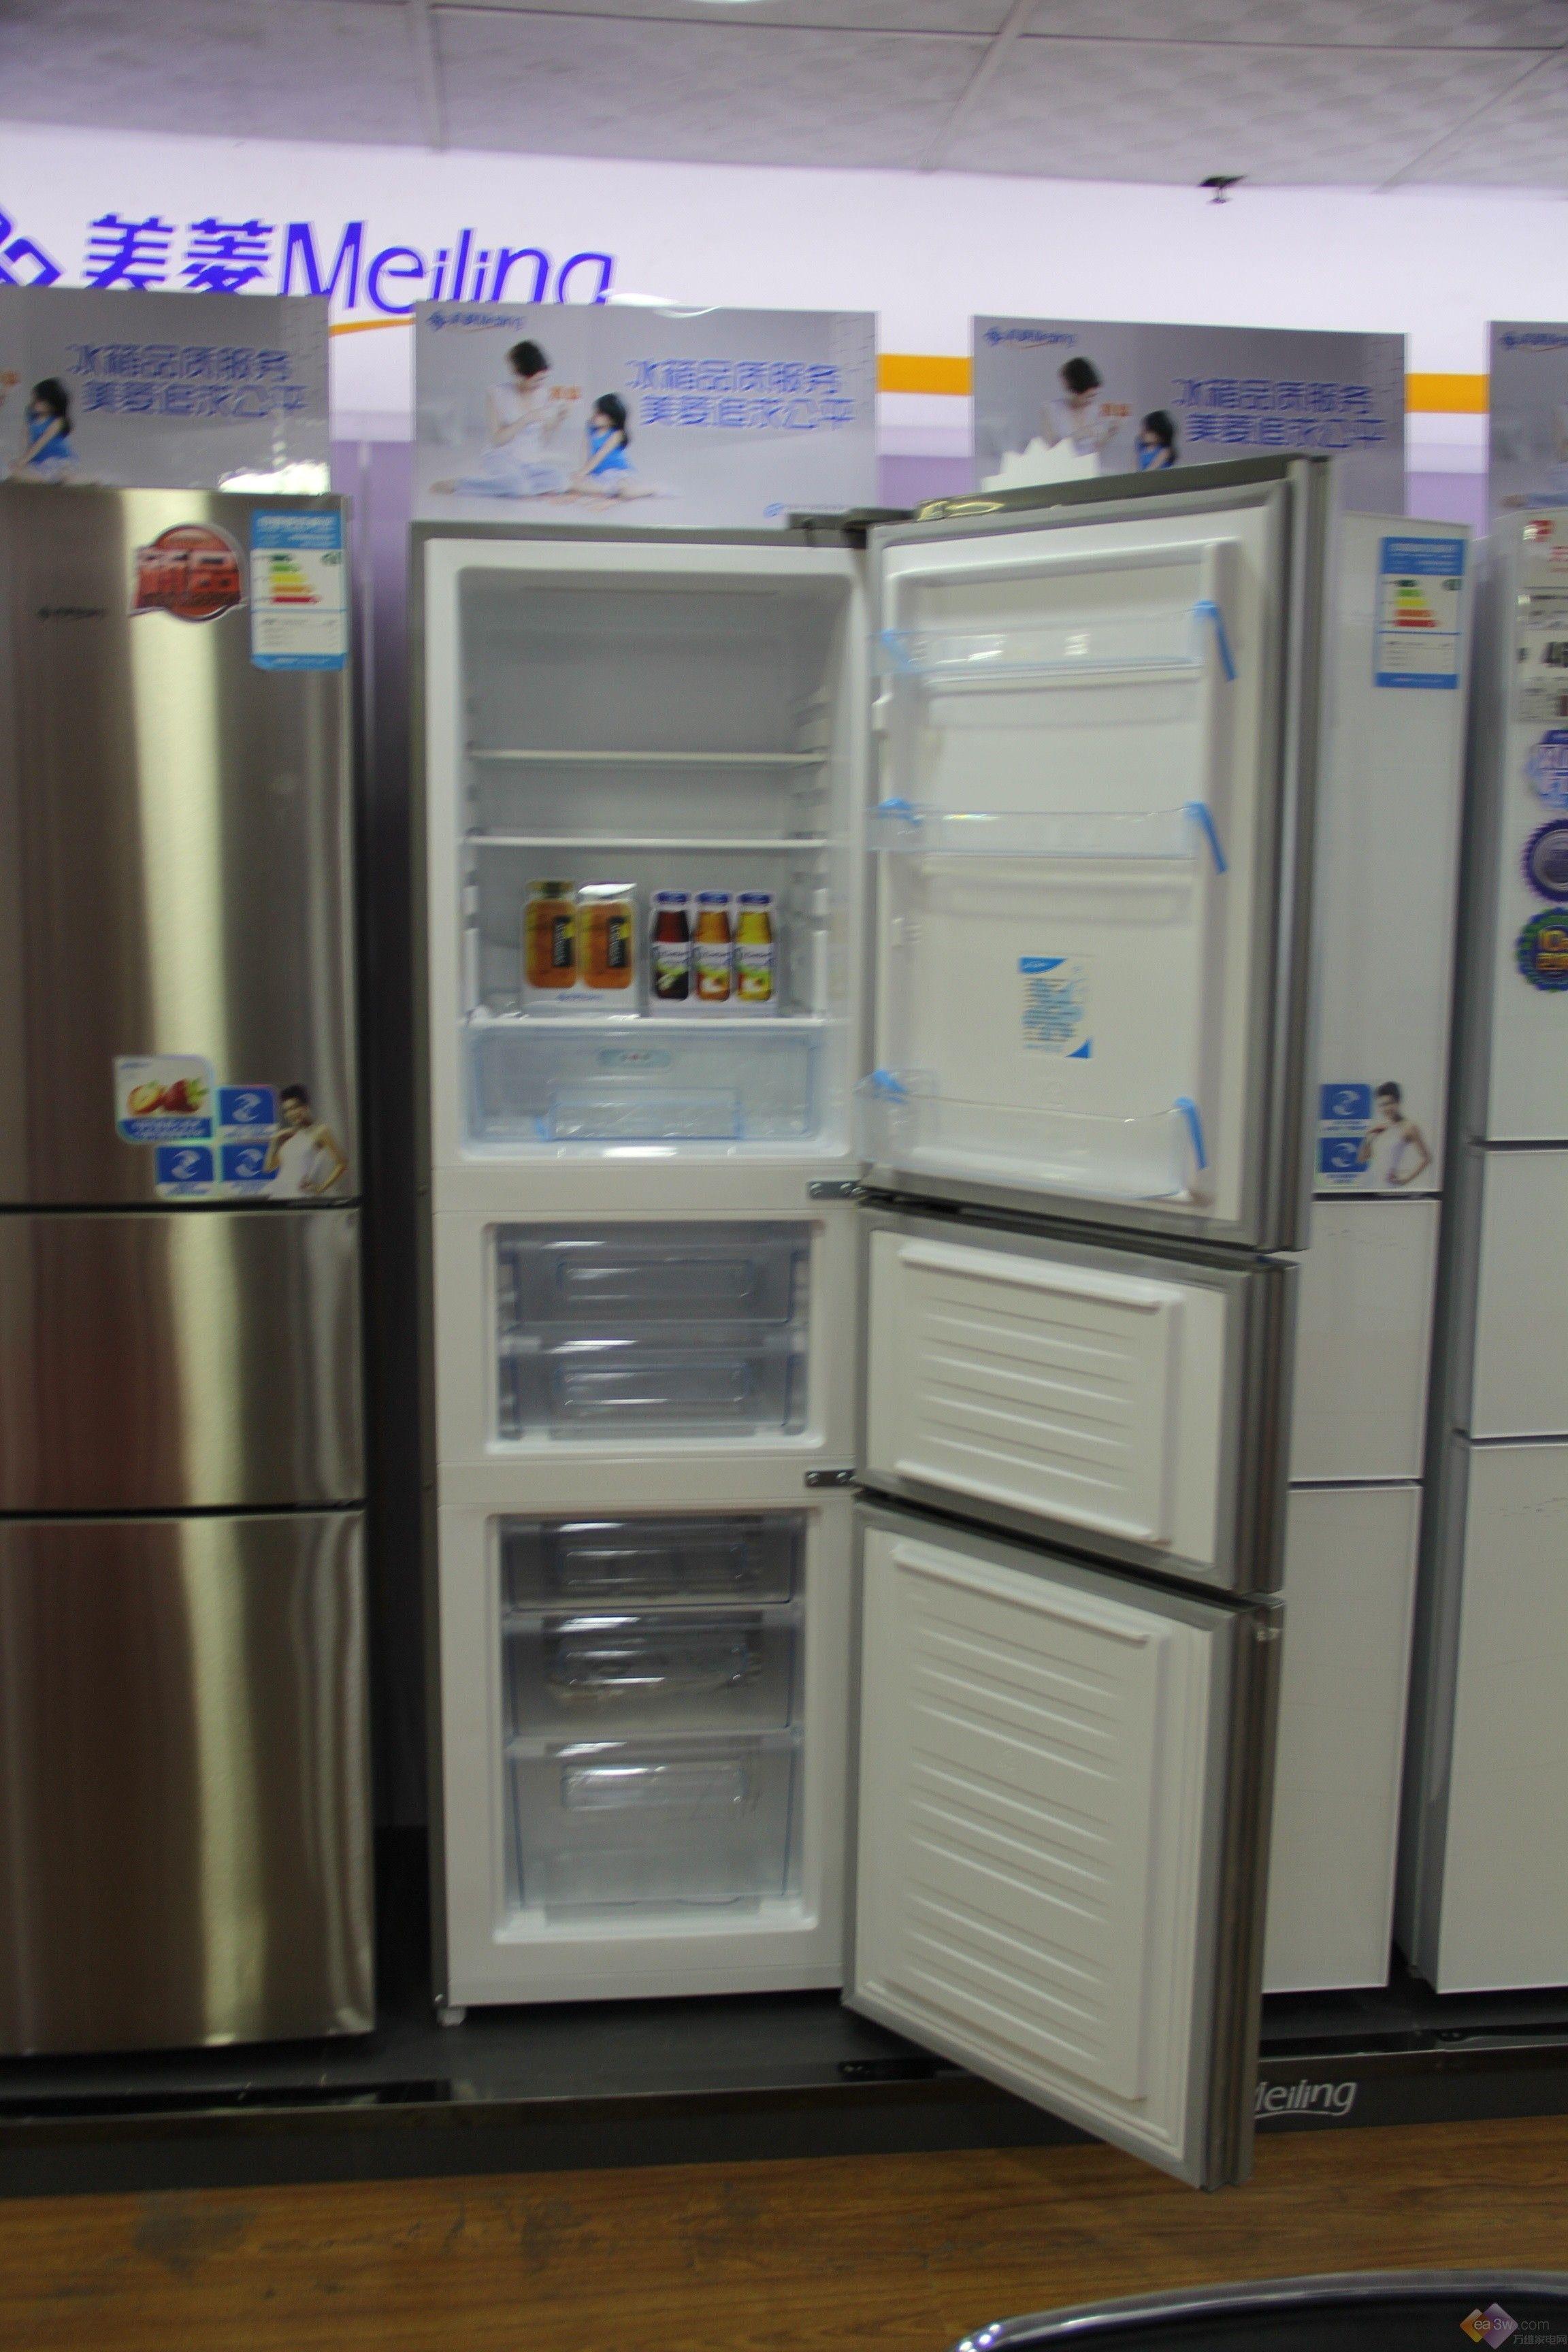 BCD-221ZE3CK软冷冻三门冰箱。  美菱BCD-221ZE3CK冰箱采用仿不锈钢金属拉丝钛银面板,时尚个性一一凸显;面板上置有触摸感应式按键,LED液晶显示屏,指尖轻触感应键,轻松惬意的操控,冰箱工作状态了然于胸。  冰箱内部采用透明内饰,通透明亮,温馨和谐气氛由此打造,冷藏室空间设计合理,适合储存各种不同大小的食物,冷冻室是抽屉式的,使食物冷冻有所分类,有效避免串味。  美菱BCD-221ZE3CK冰箱应用了三温区系统,冷藏室、冷冻室还可单独关闭,省电、省心。自动速冻,快速制冷,食物营养不流失,